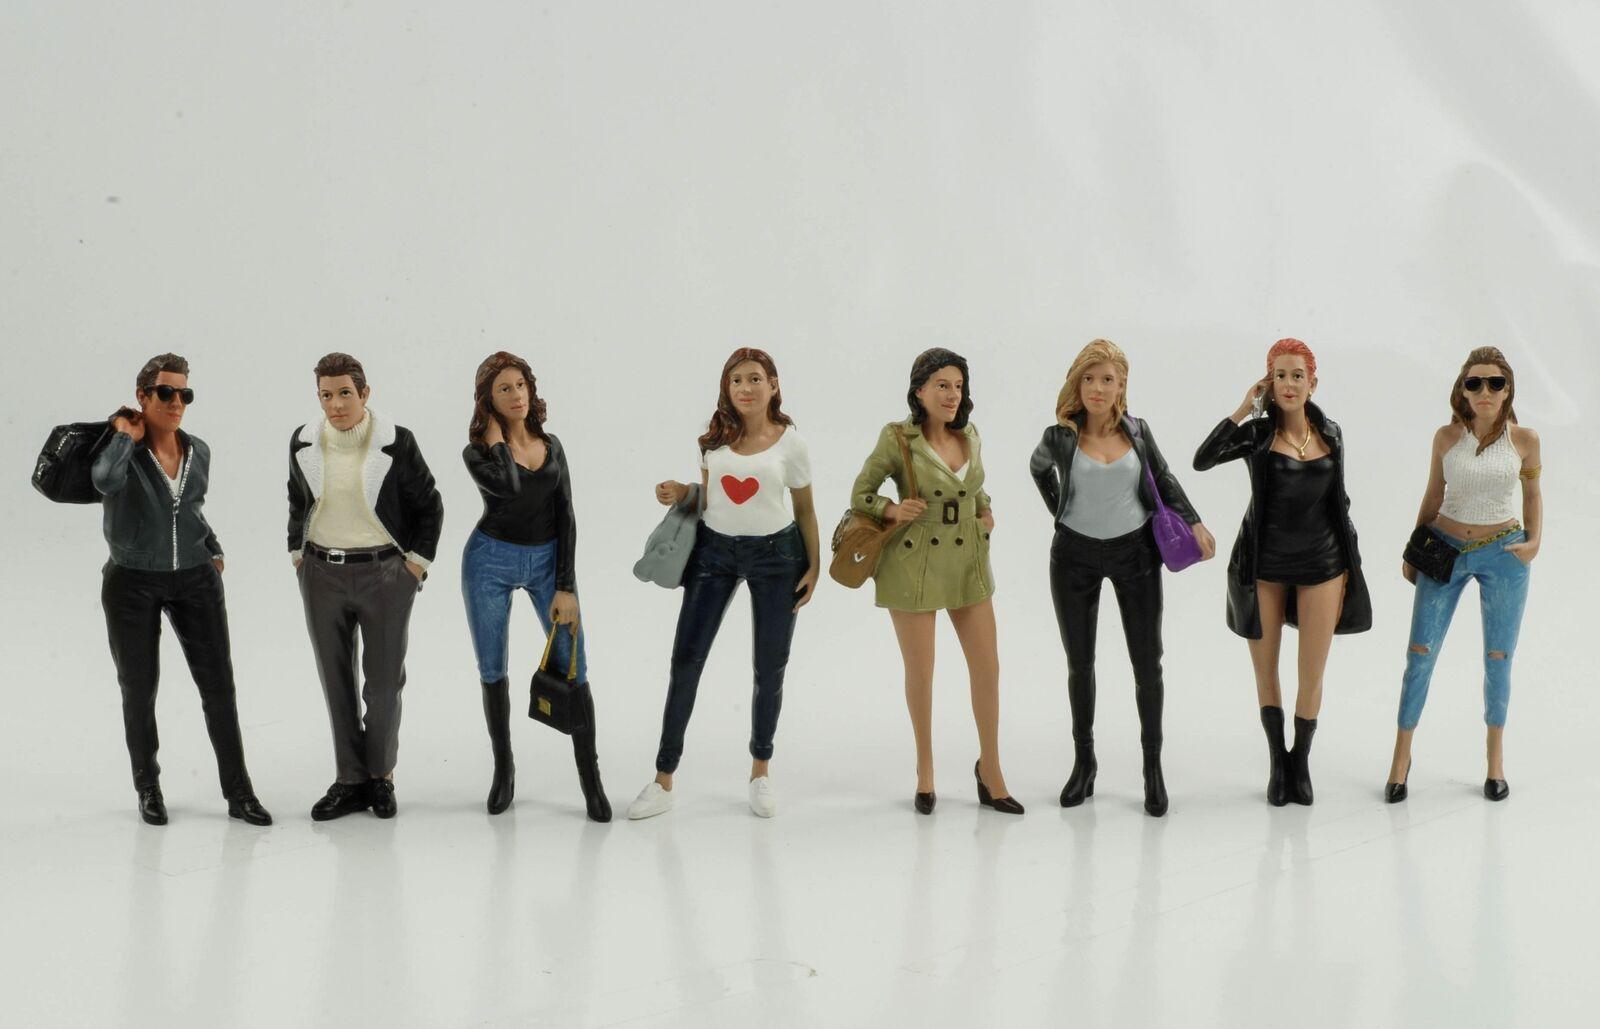 Figurine Ladies Night Set 8 Piece Woman Mann Figurines 1 18 American Diorama New